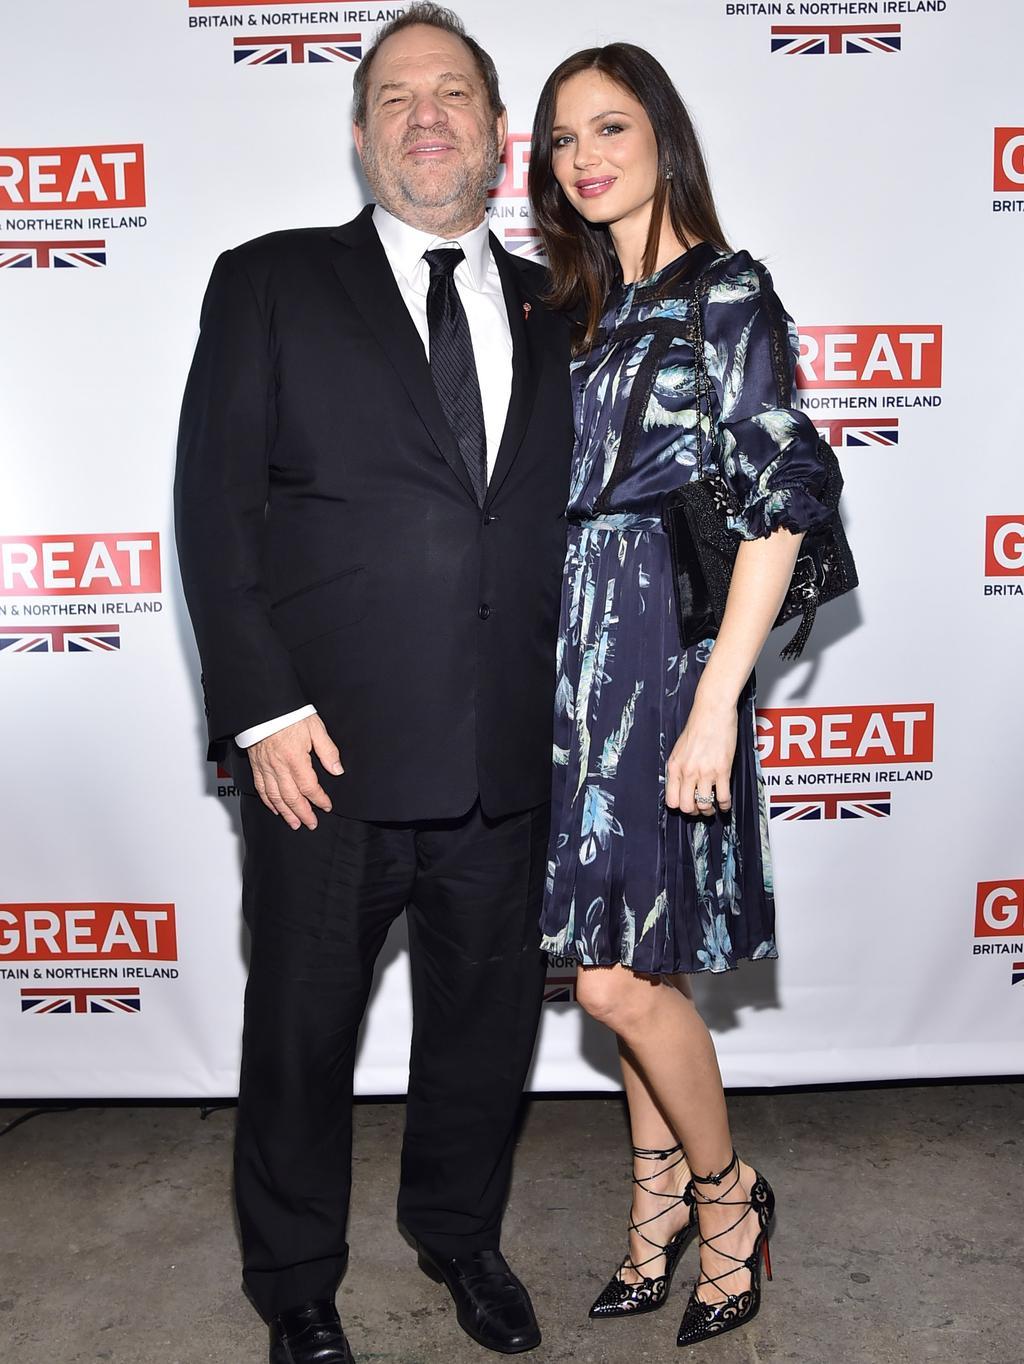 78442d1581 Marchesa designer Georgina Chapman with movie mogul husband Harvey  Weinstein. Picture: Mike Coppola/